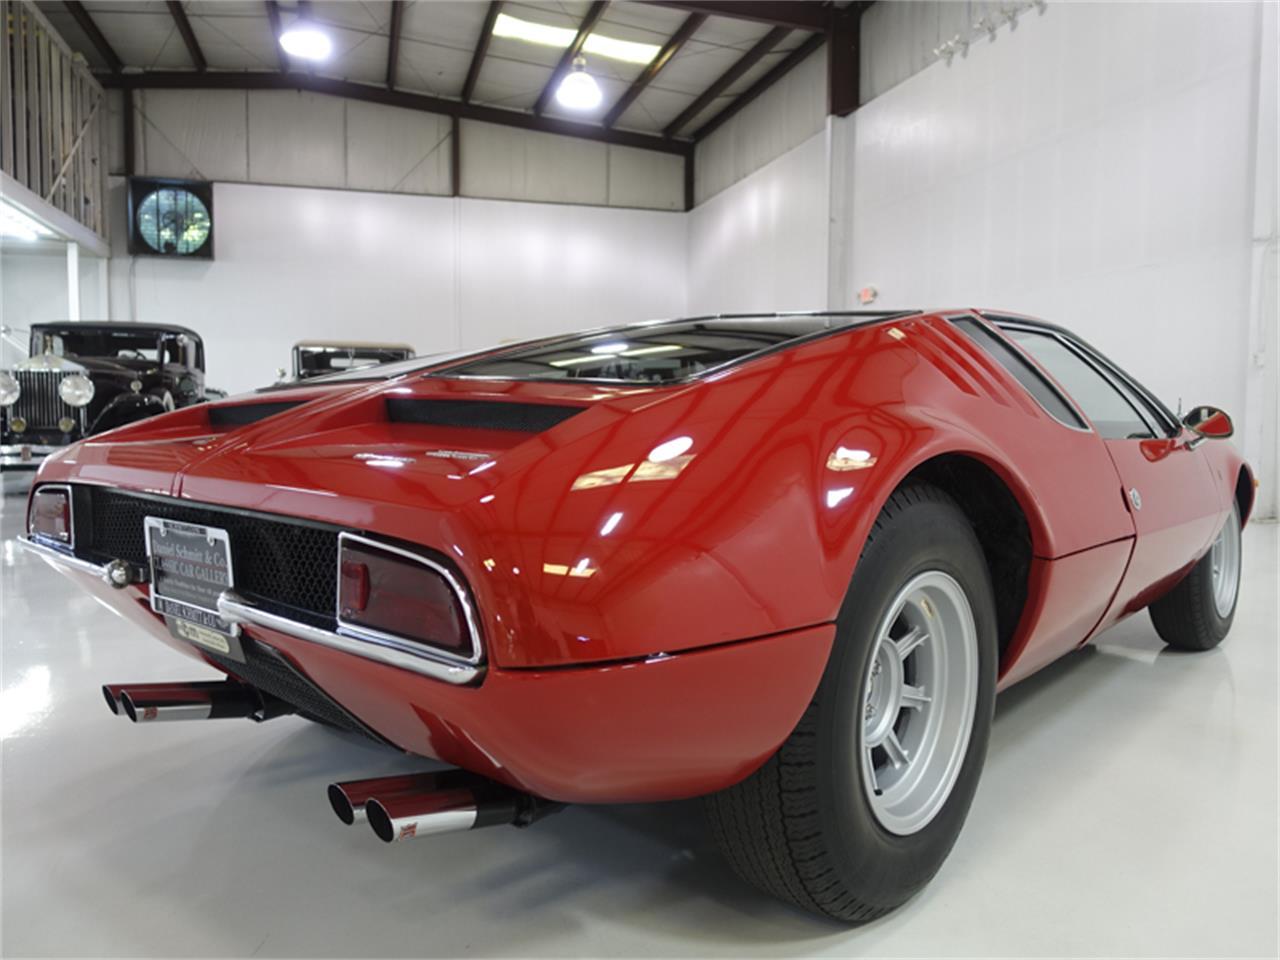 1970 De Tomaso Mangusta (CC-1266622) for sale in Saint Louis, Missouri